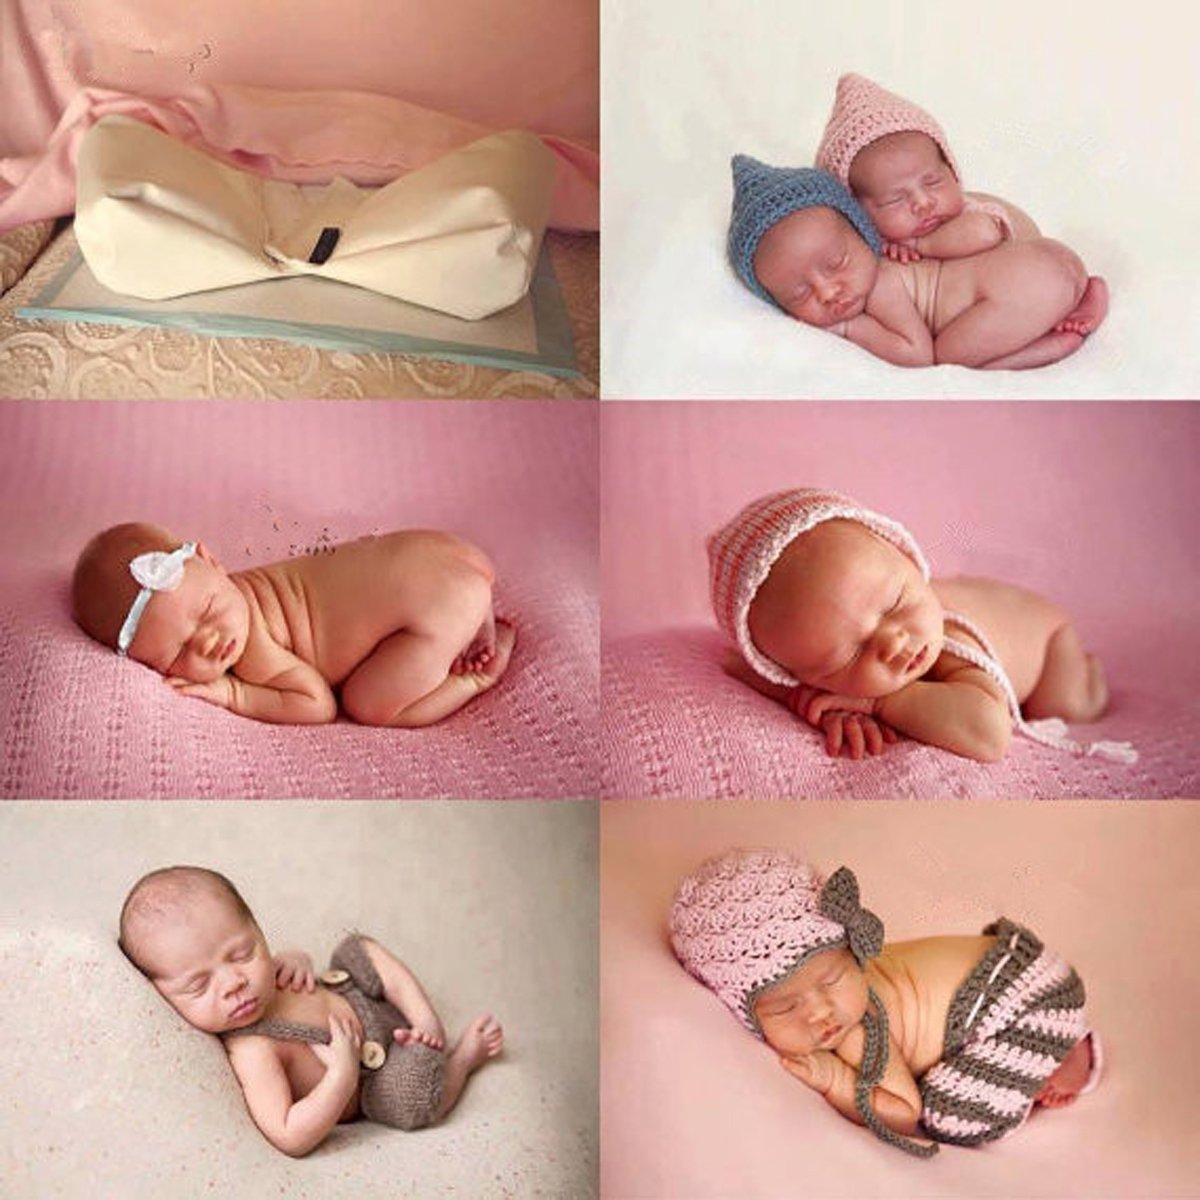 Huntfgold Newborn Photography Butterfly Posing Pillow Infant Poser Positioner Pillow Photo Prop Baby Basket Filler Kit White